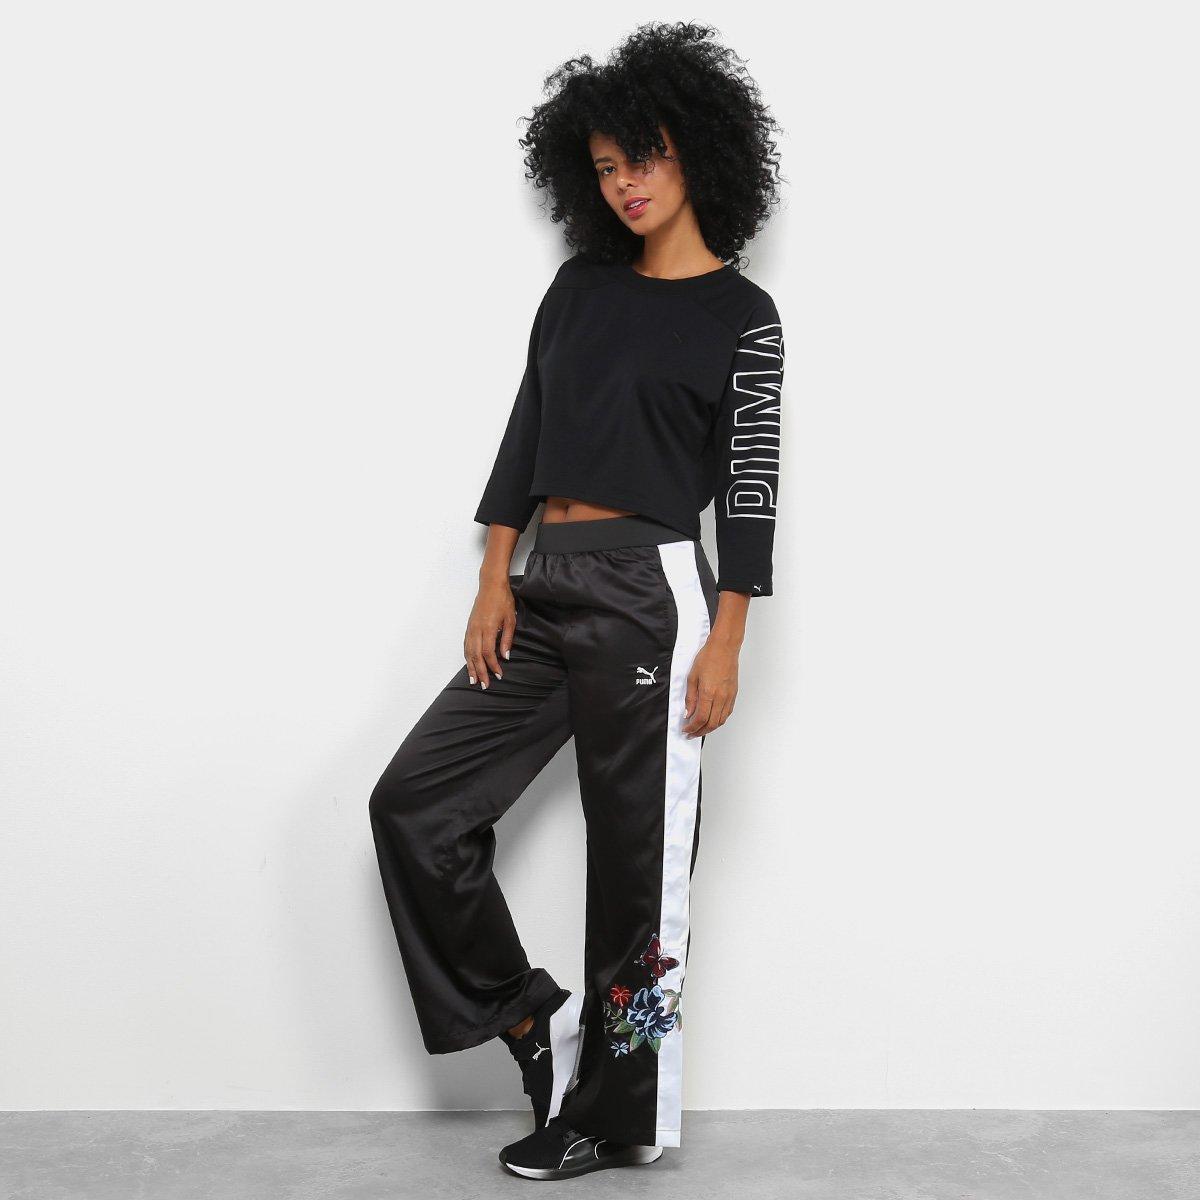 Moletom Puma Fusion Cropped 7 8 Sweatshirt Feminino - Preto - Compre ... 4701fc5e6e799